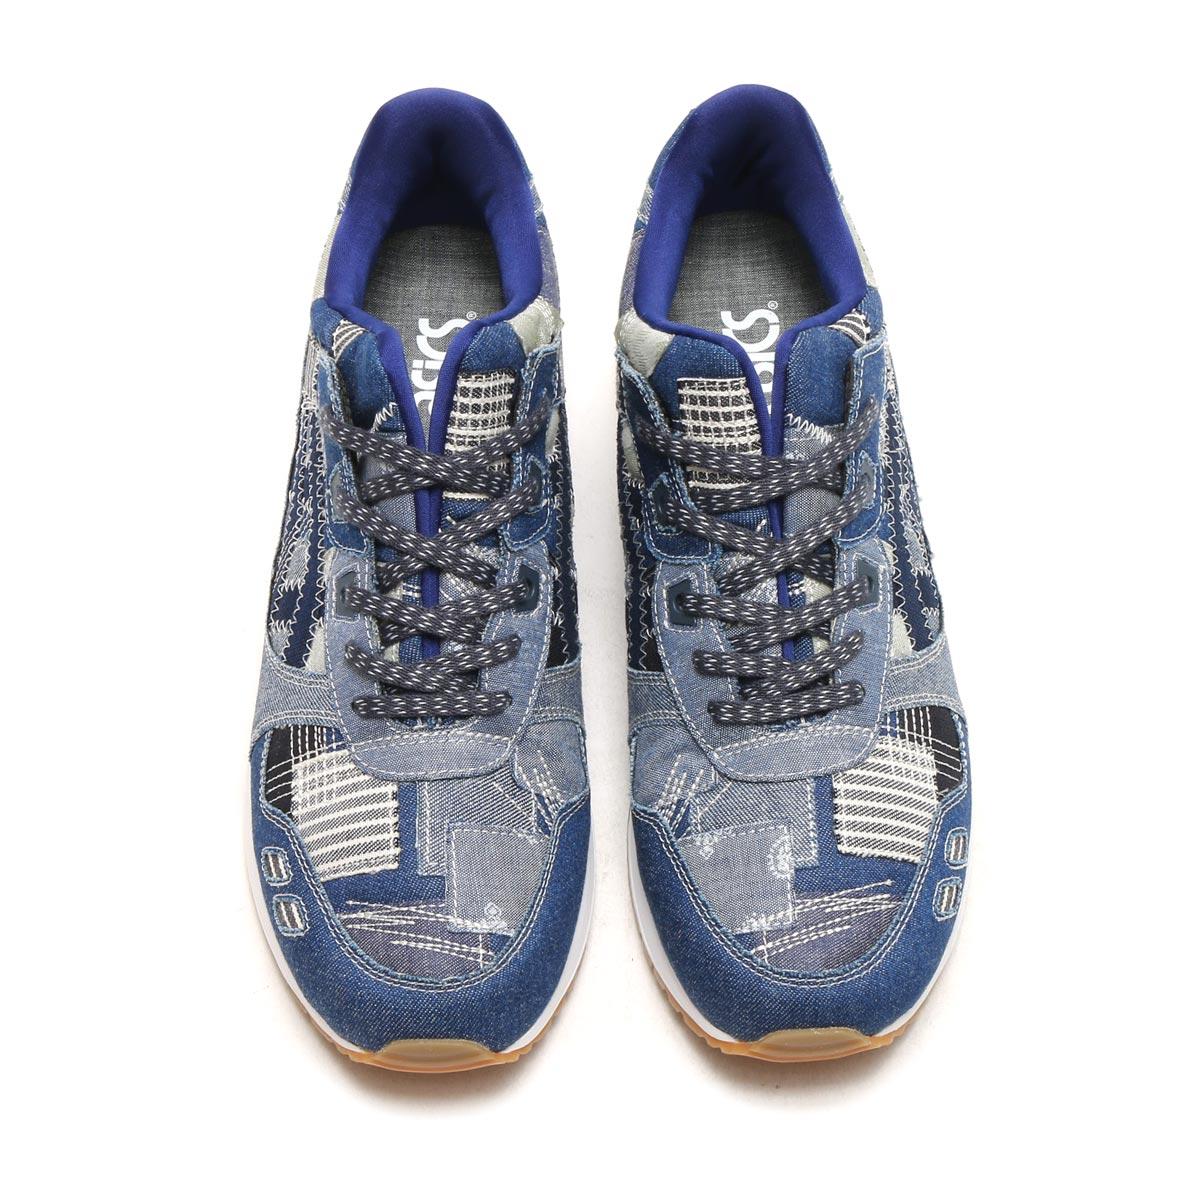 asics tiger gel-lyte ii ranru pack indigo blue 7